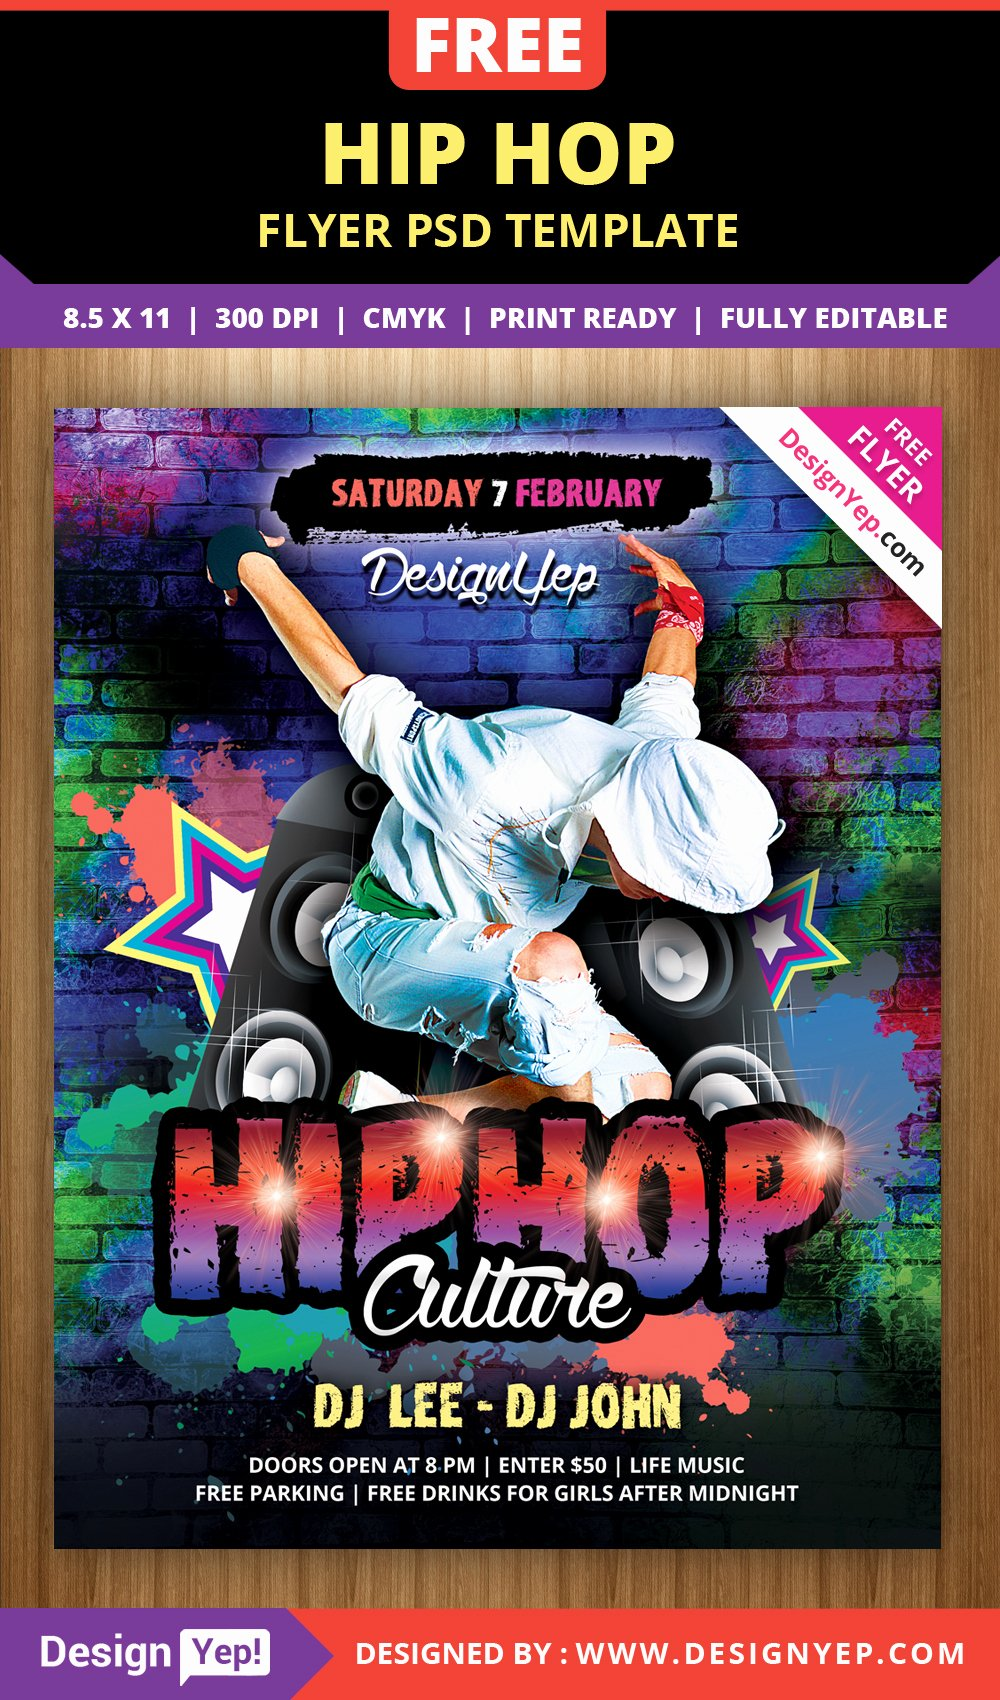 Free Hip Hop Flyer Psd Template Designyep